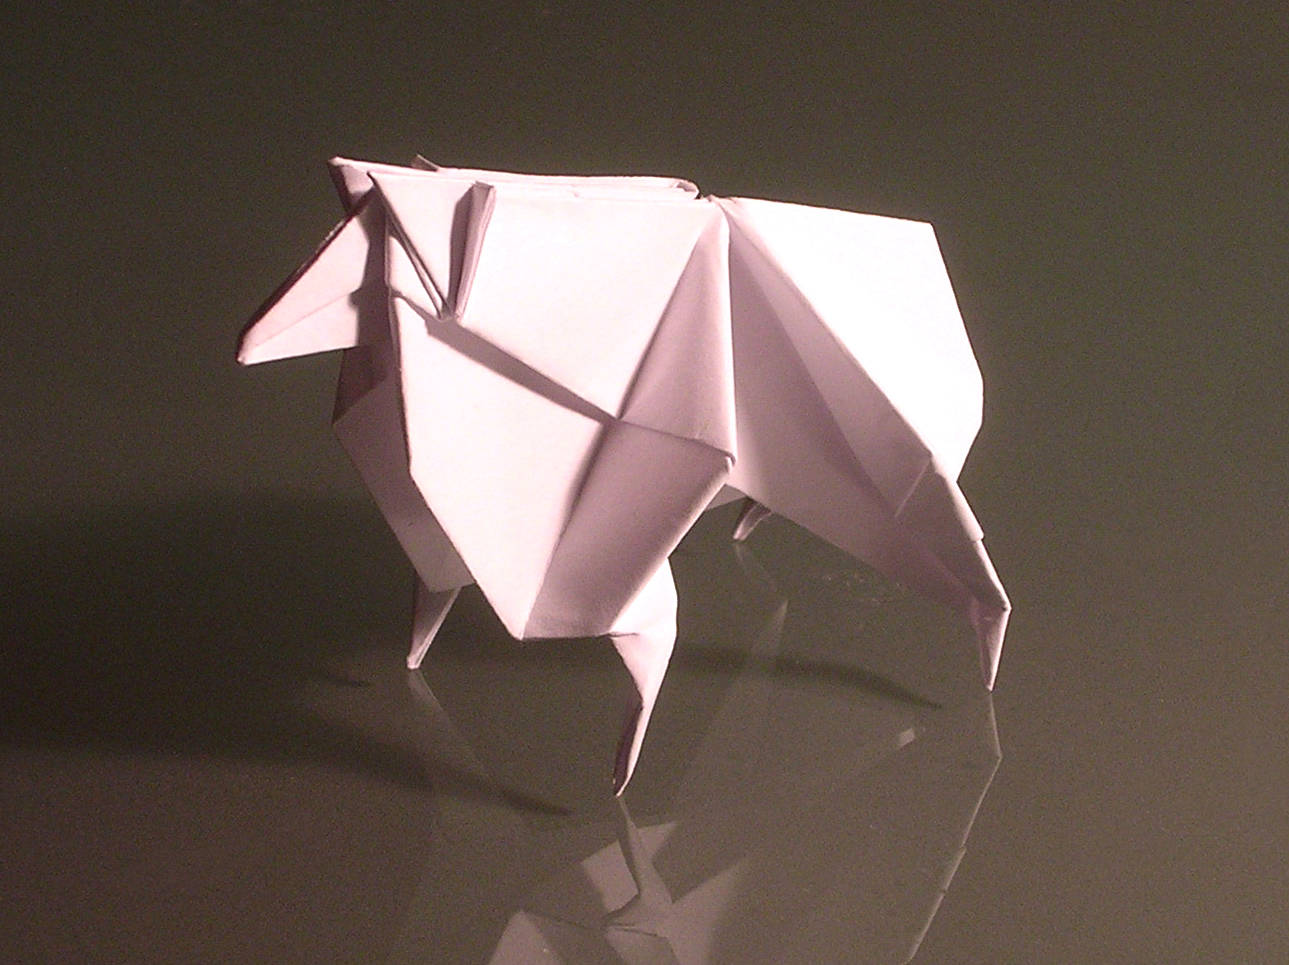 Blade Runner 2049 - Origami Sheep Prop  Ebay-4863